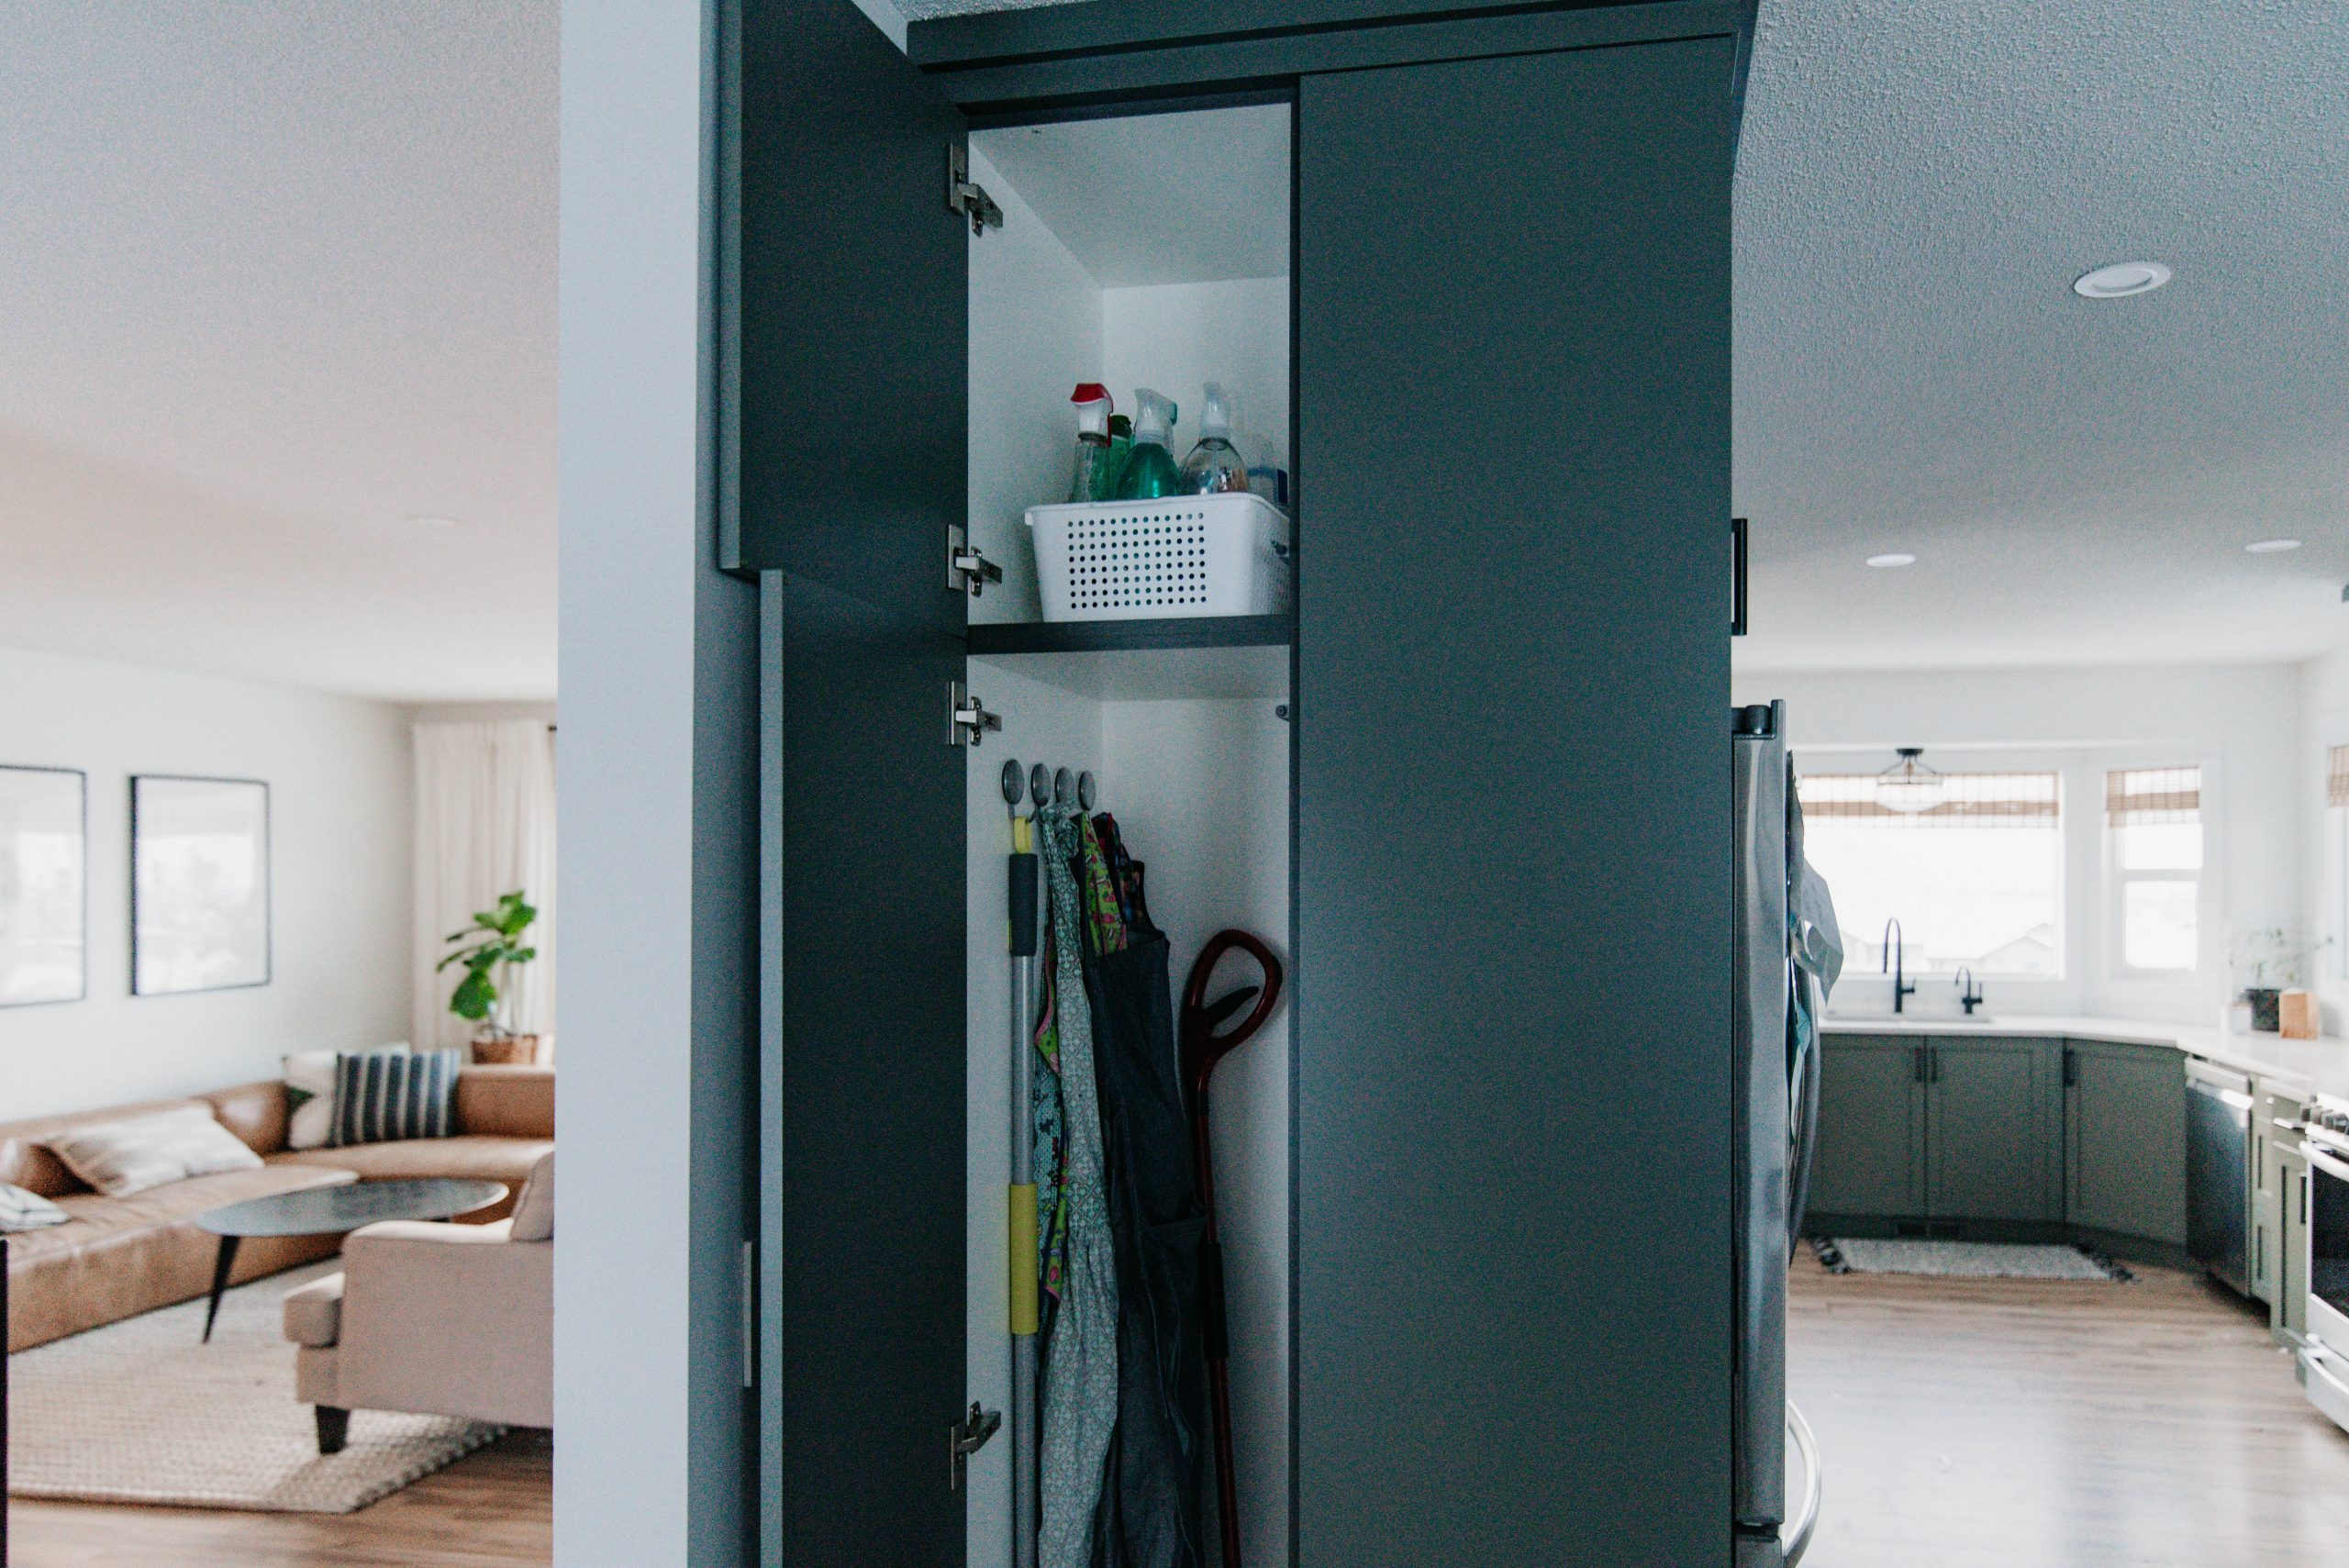 Cleaning cupboard organization ideas